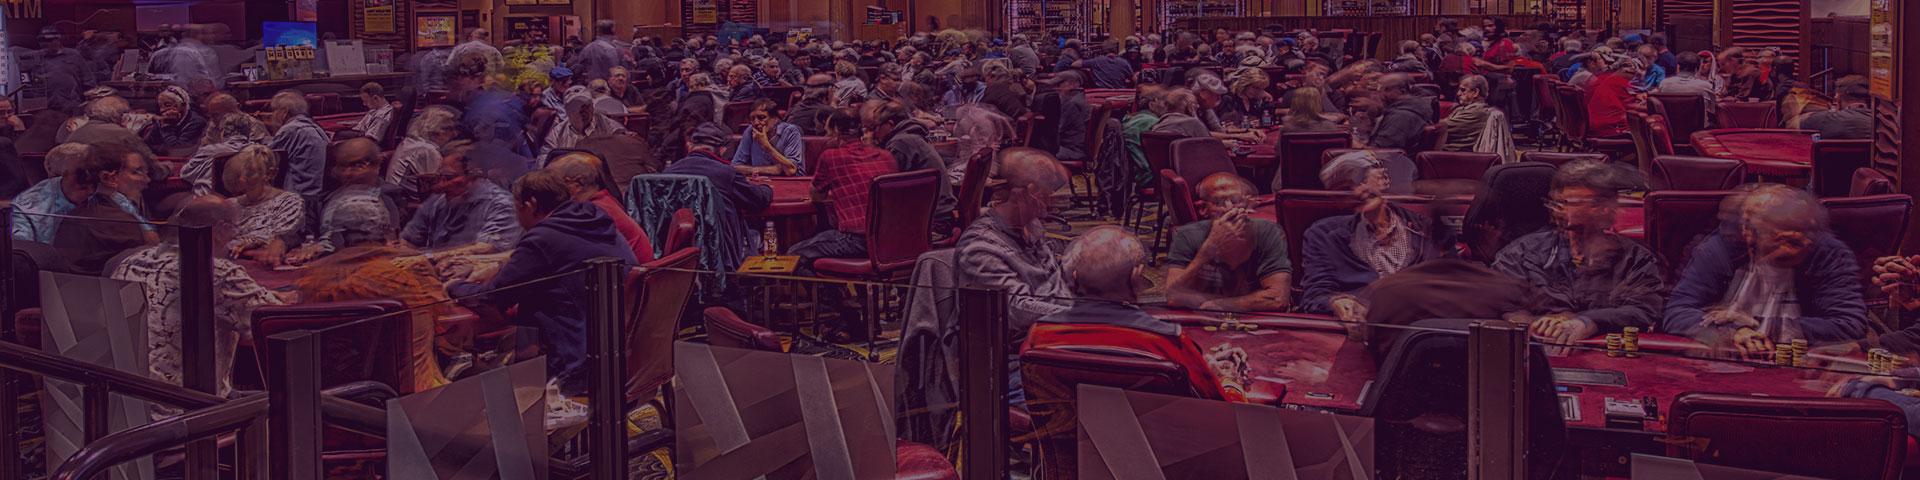 Poker rooms near ft lauderdale